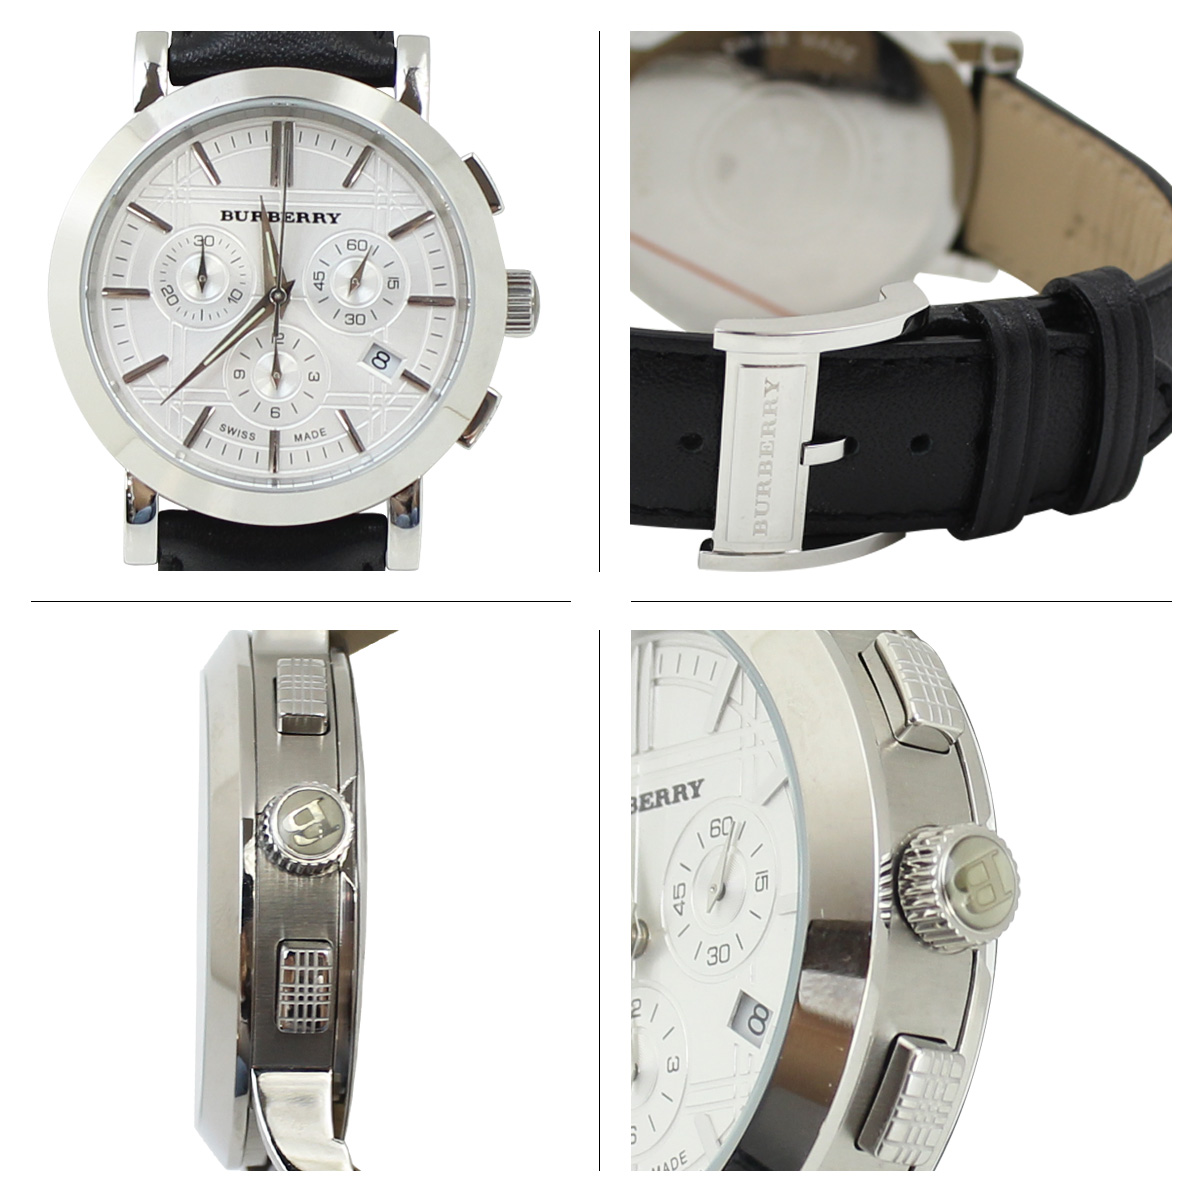 burberry heritage chronograph watch